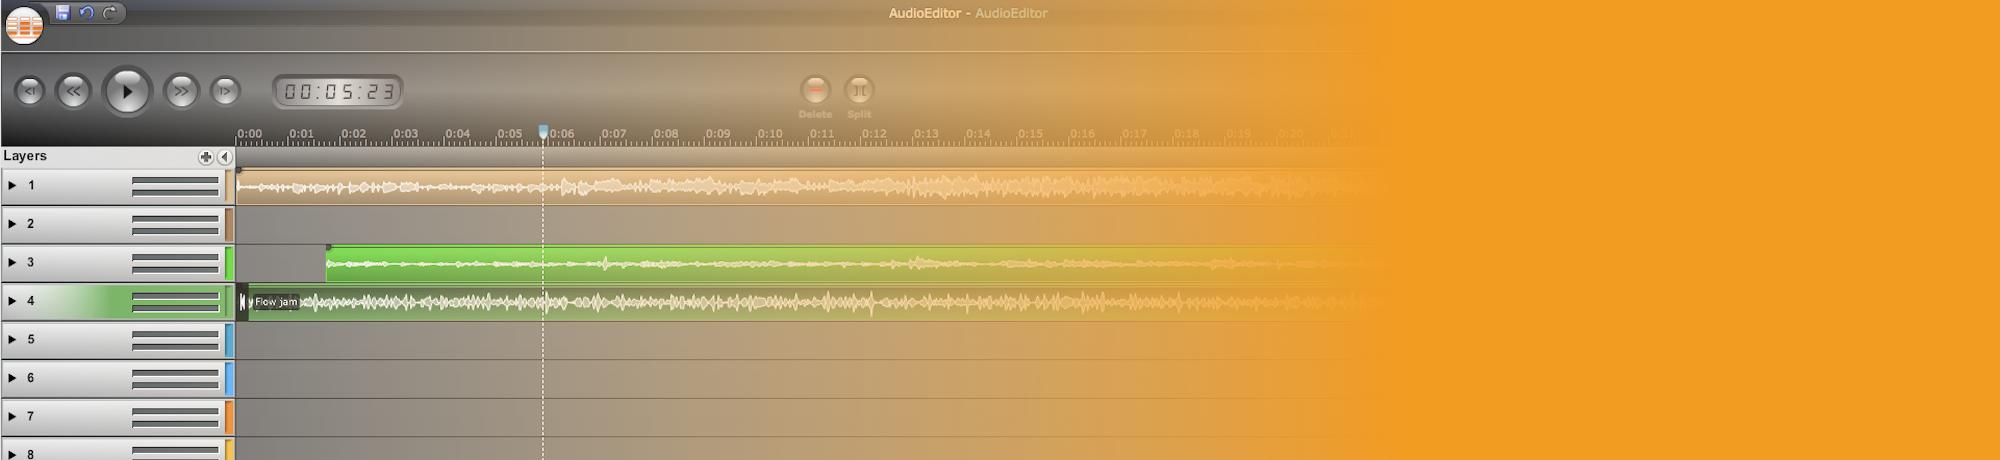 AudioEditor